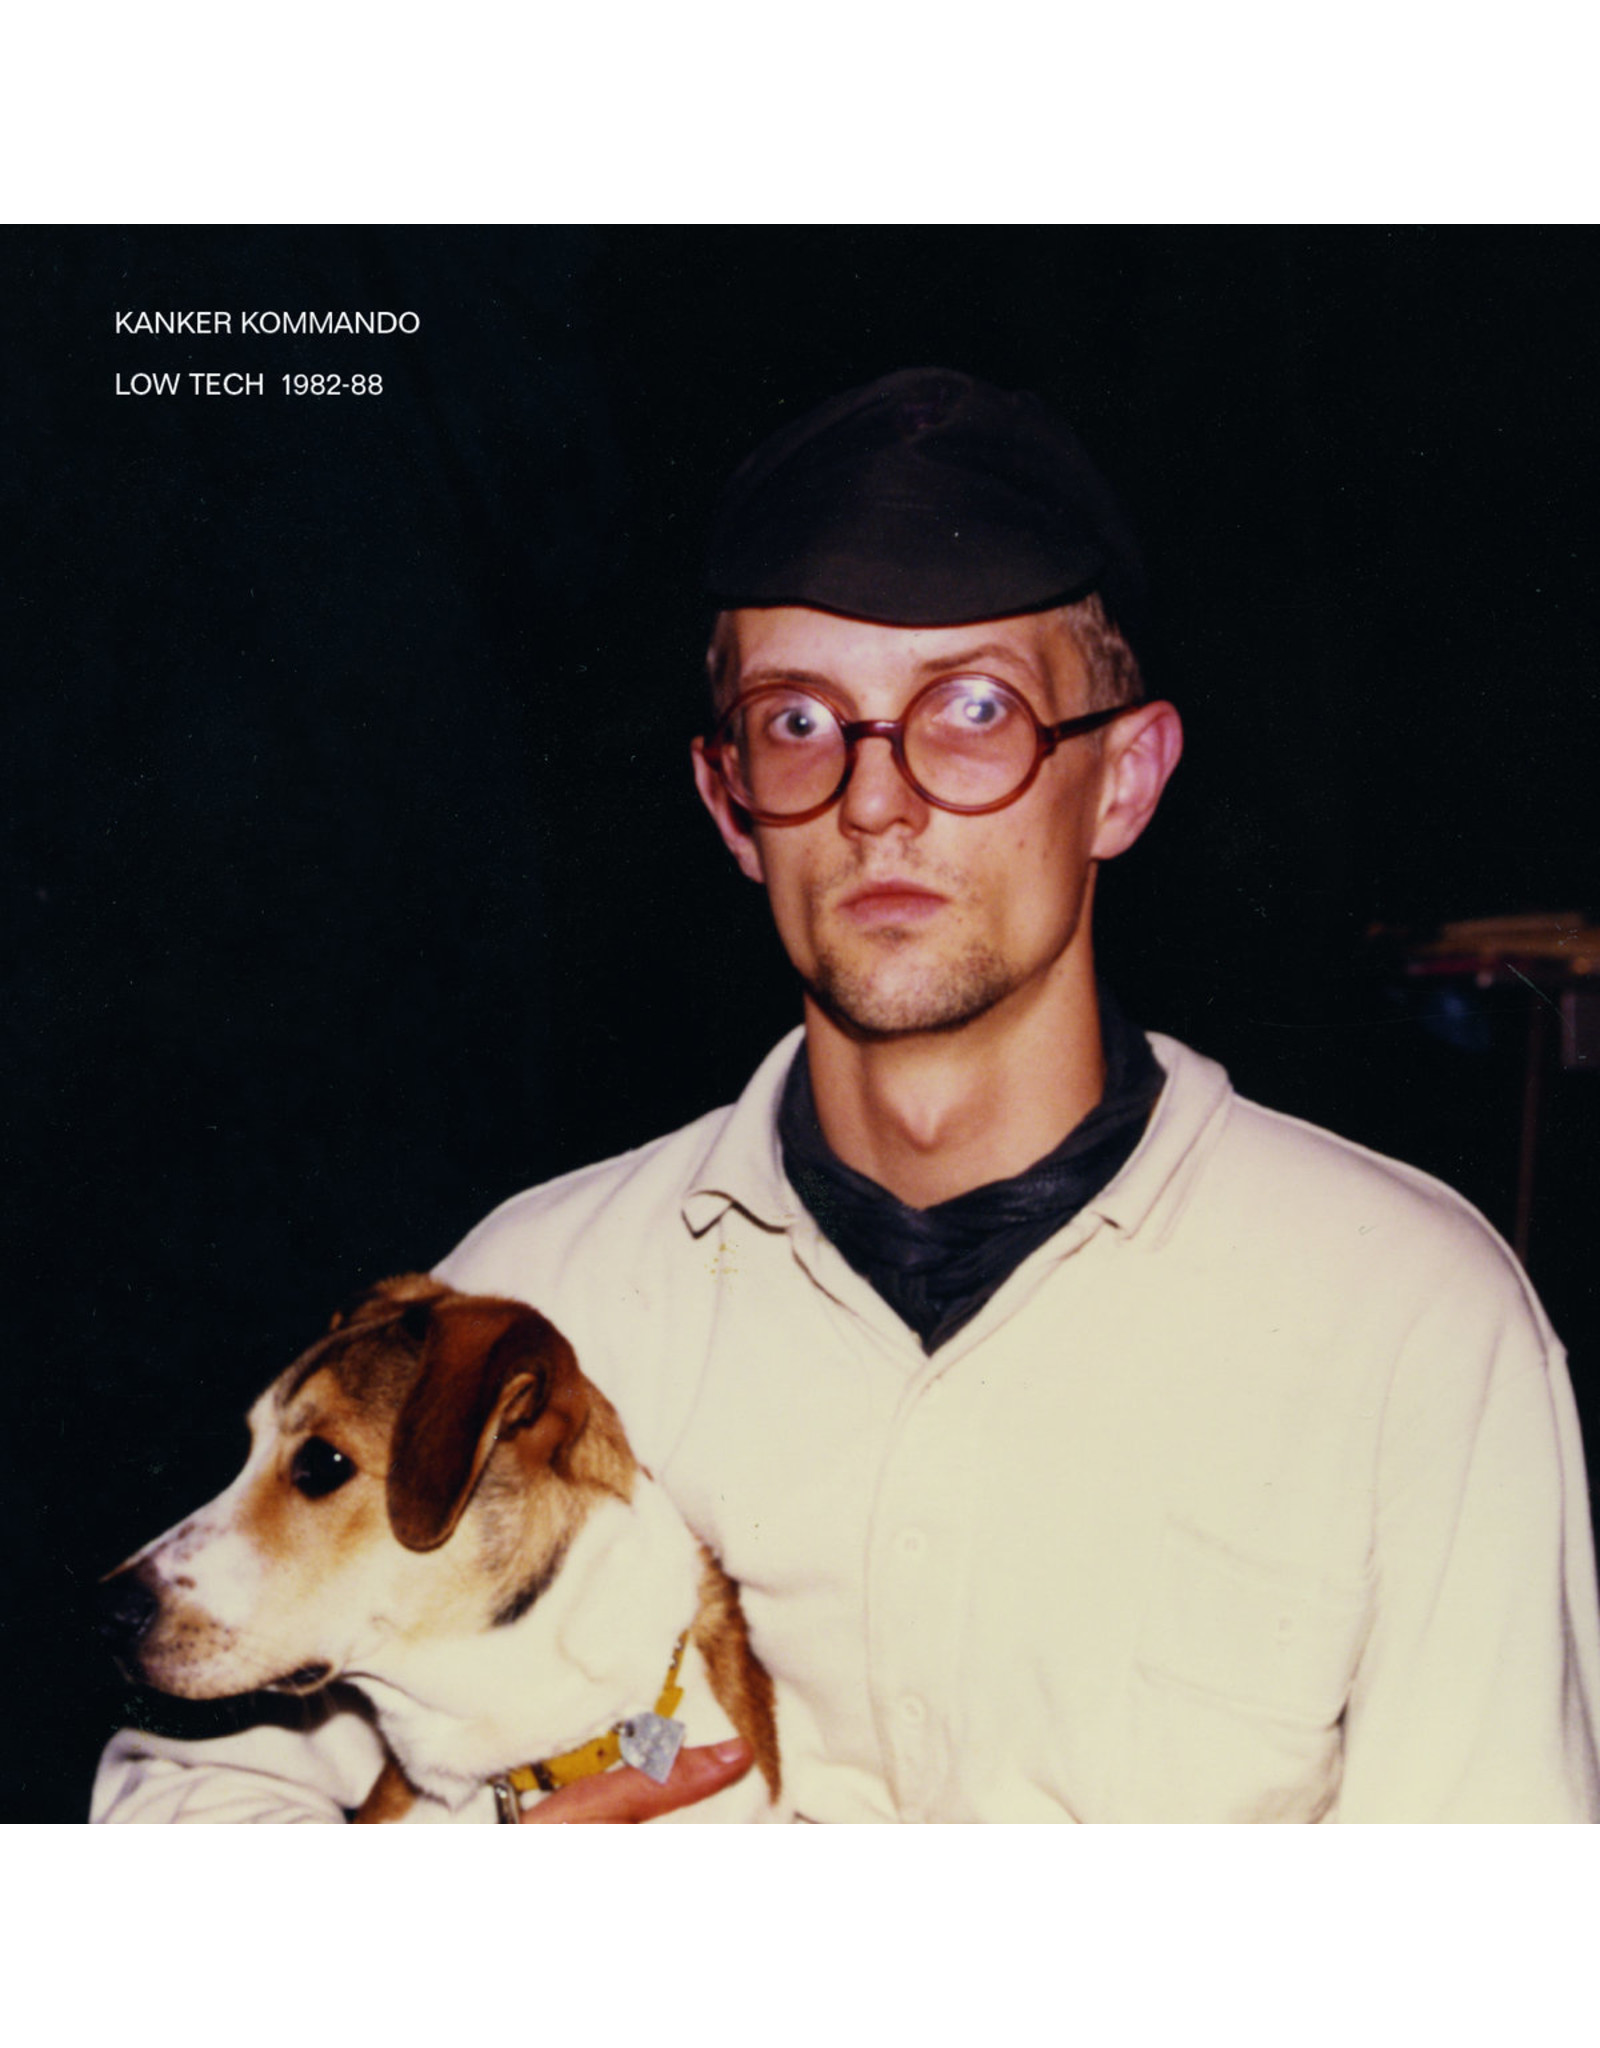 New Vinyl Kanker Kommando - Lo Tech 1982-88 LP